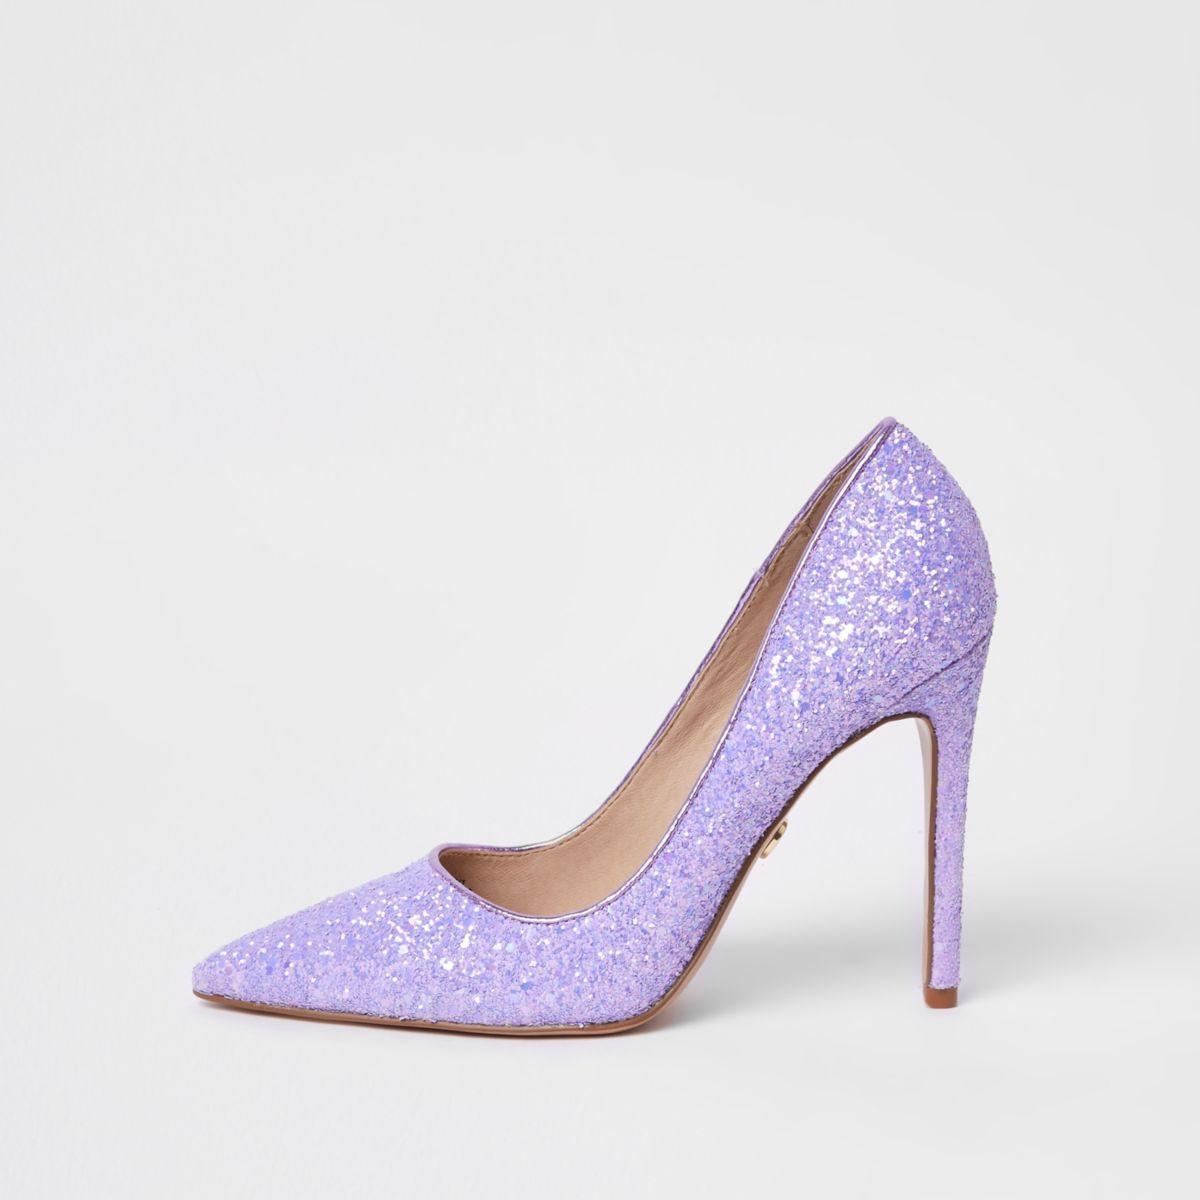 Purple glitter court shoes